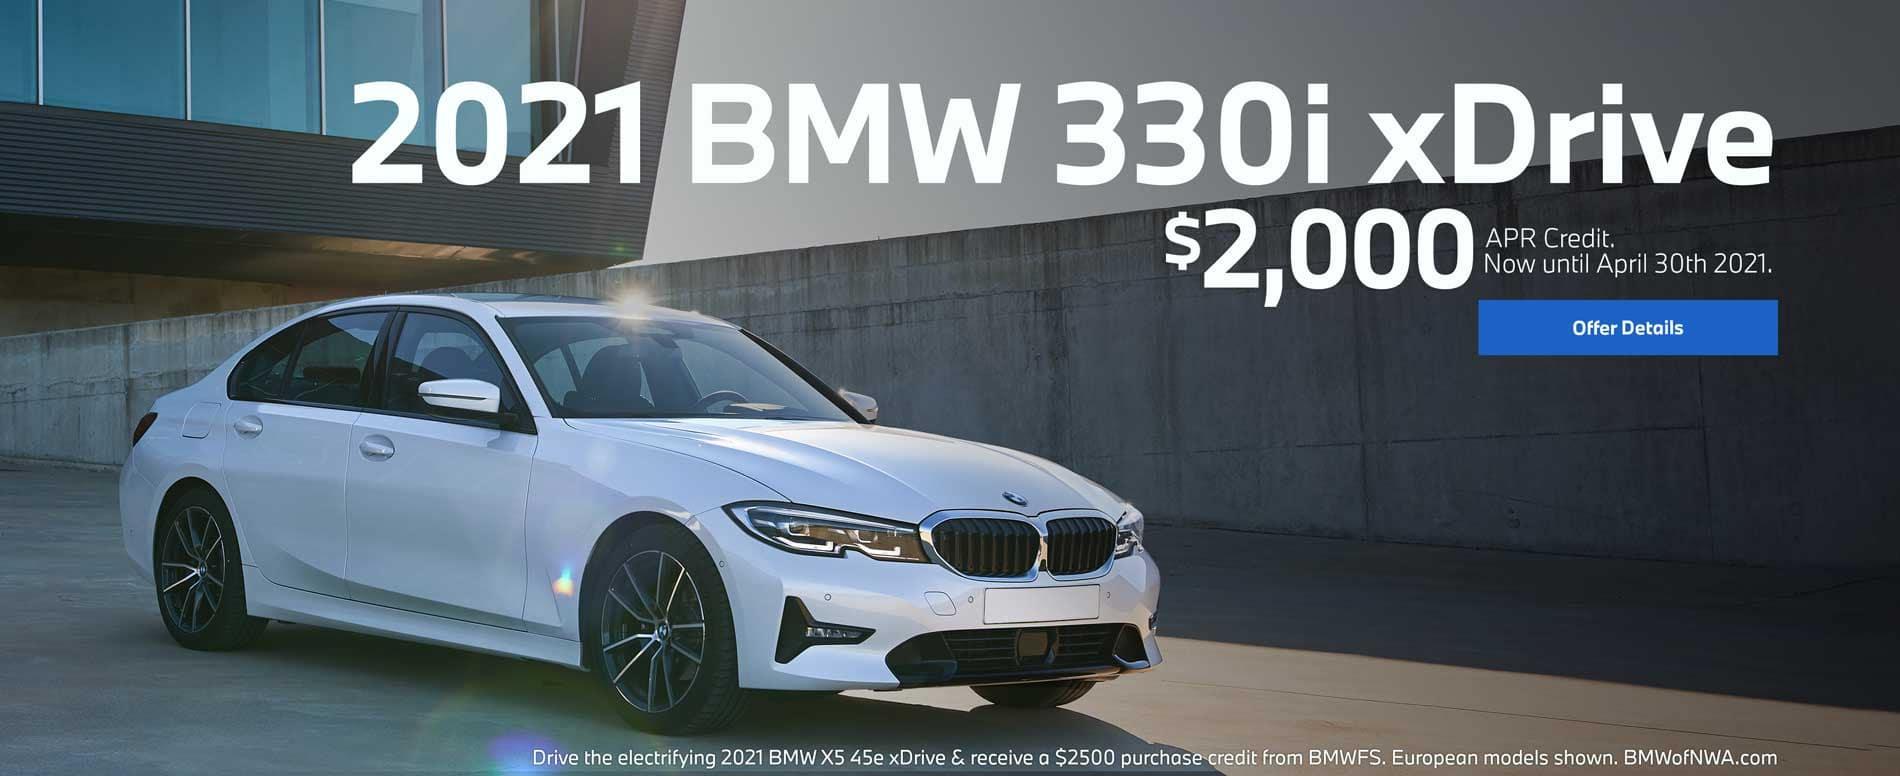 2021 BMW 330i xDrive $2000 APR Credit